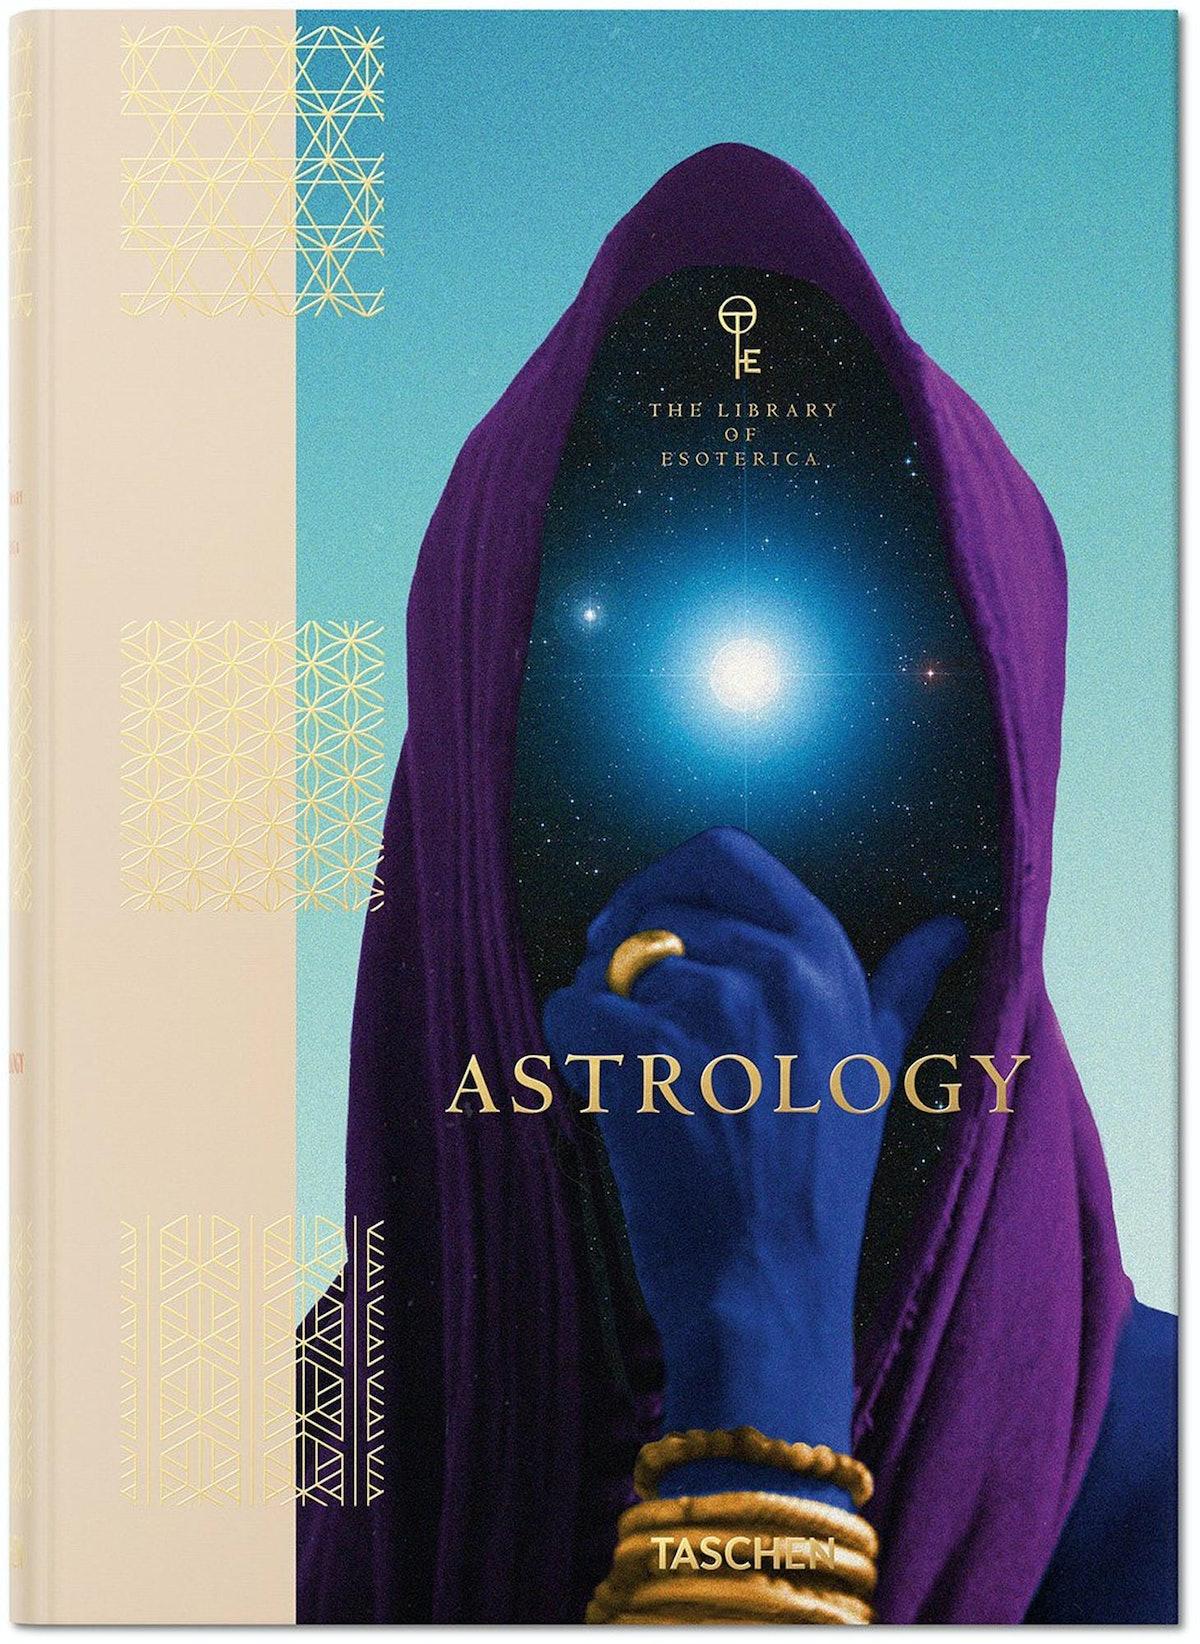 esoterica_astrology_va_gb_3d_08004_2010061714_id_1325747